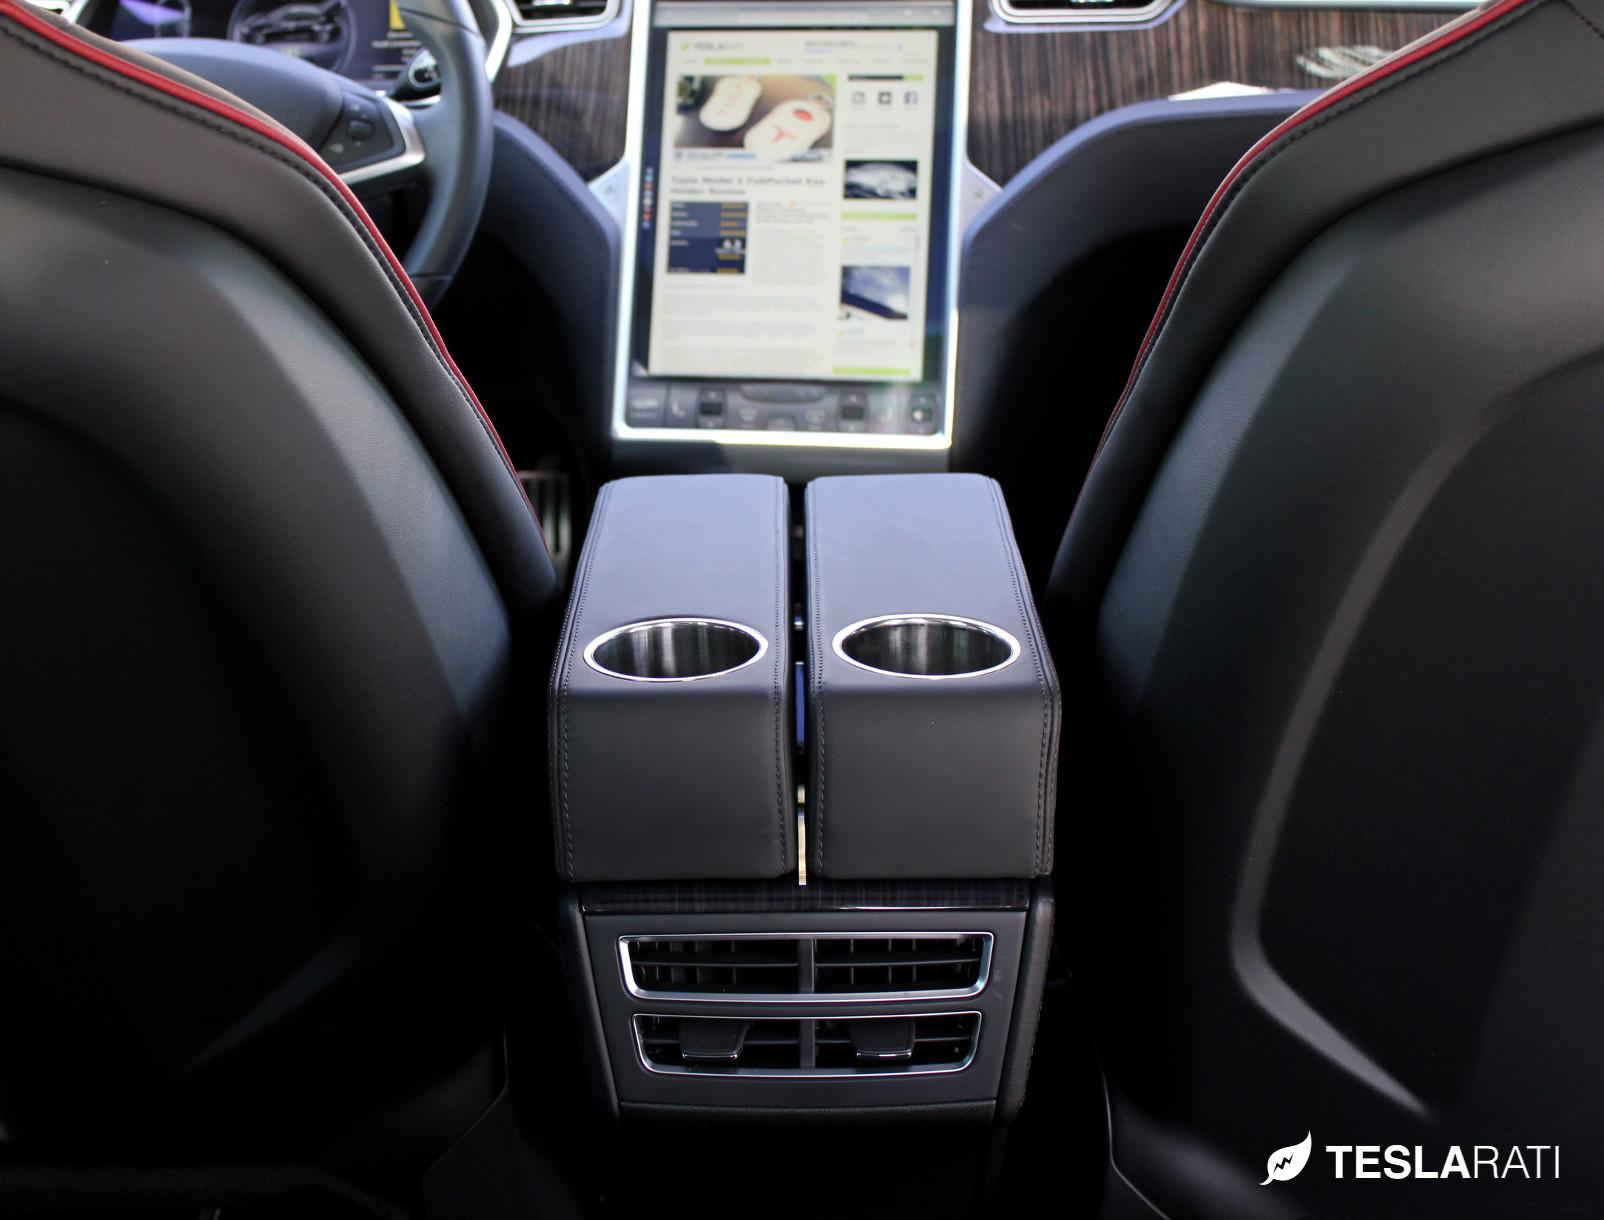 PARZ_Tesla_Rear_Seat_Cup_Holders_14